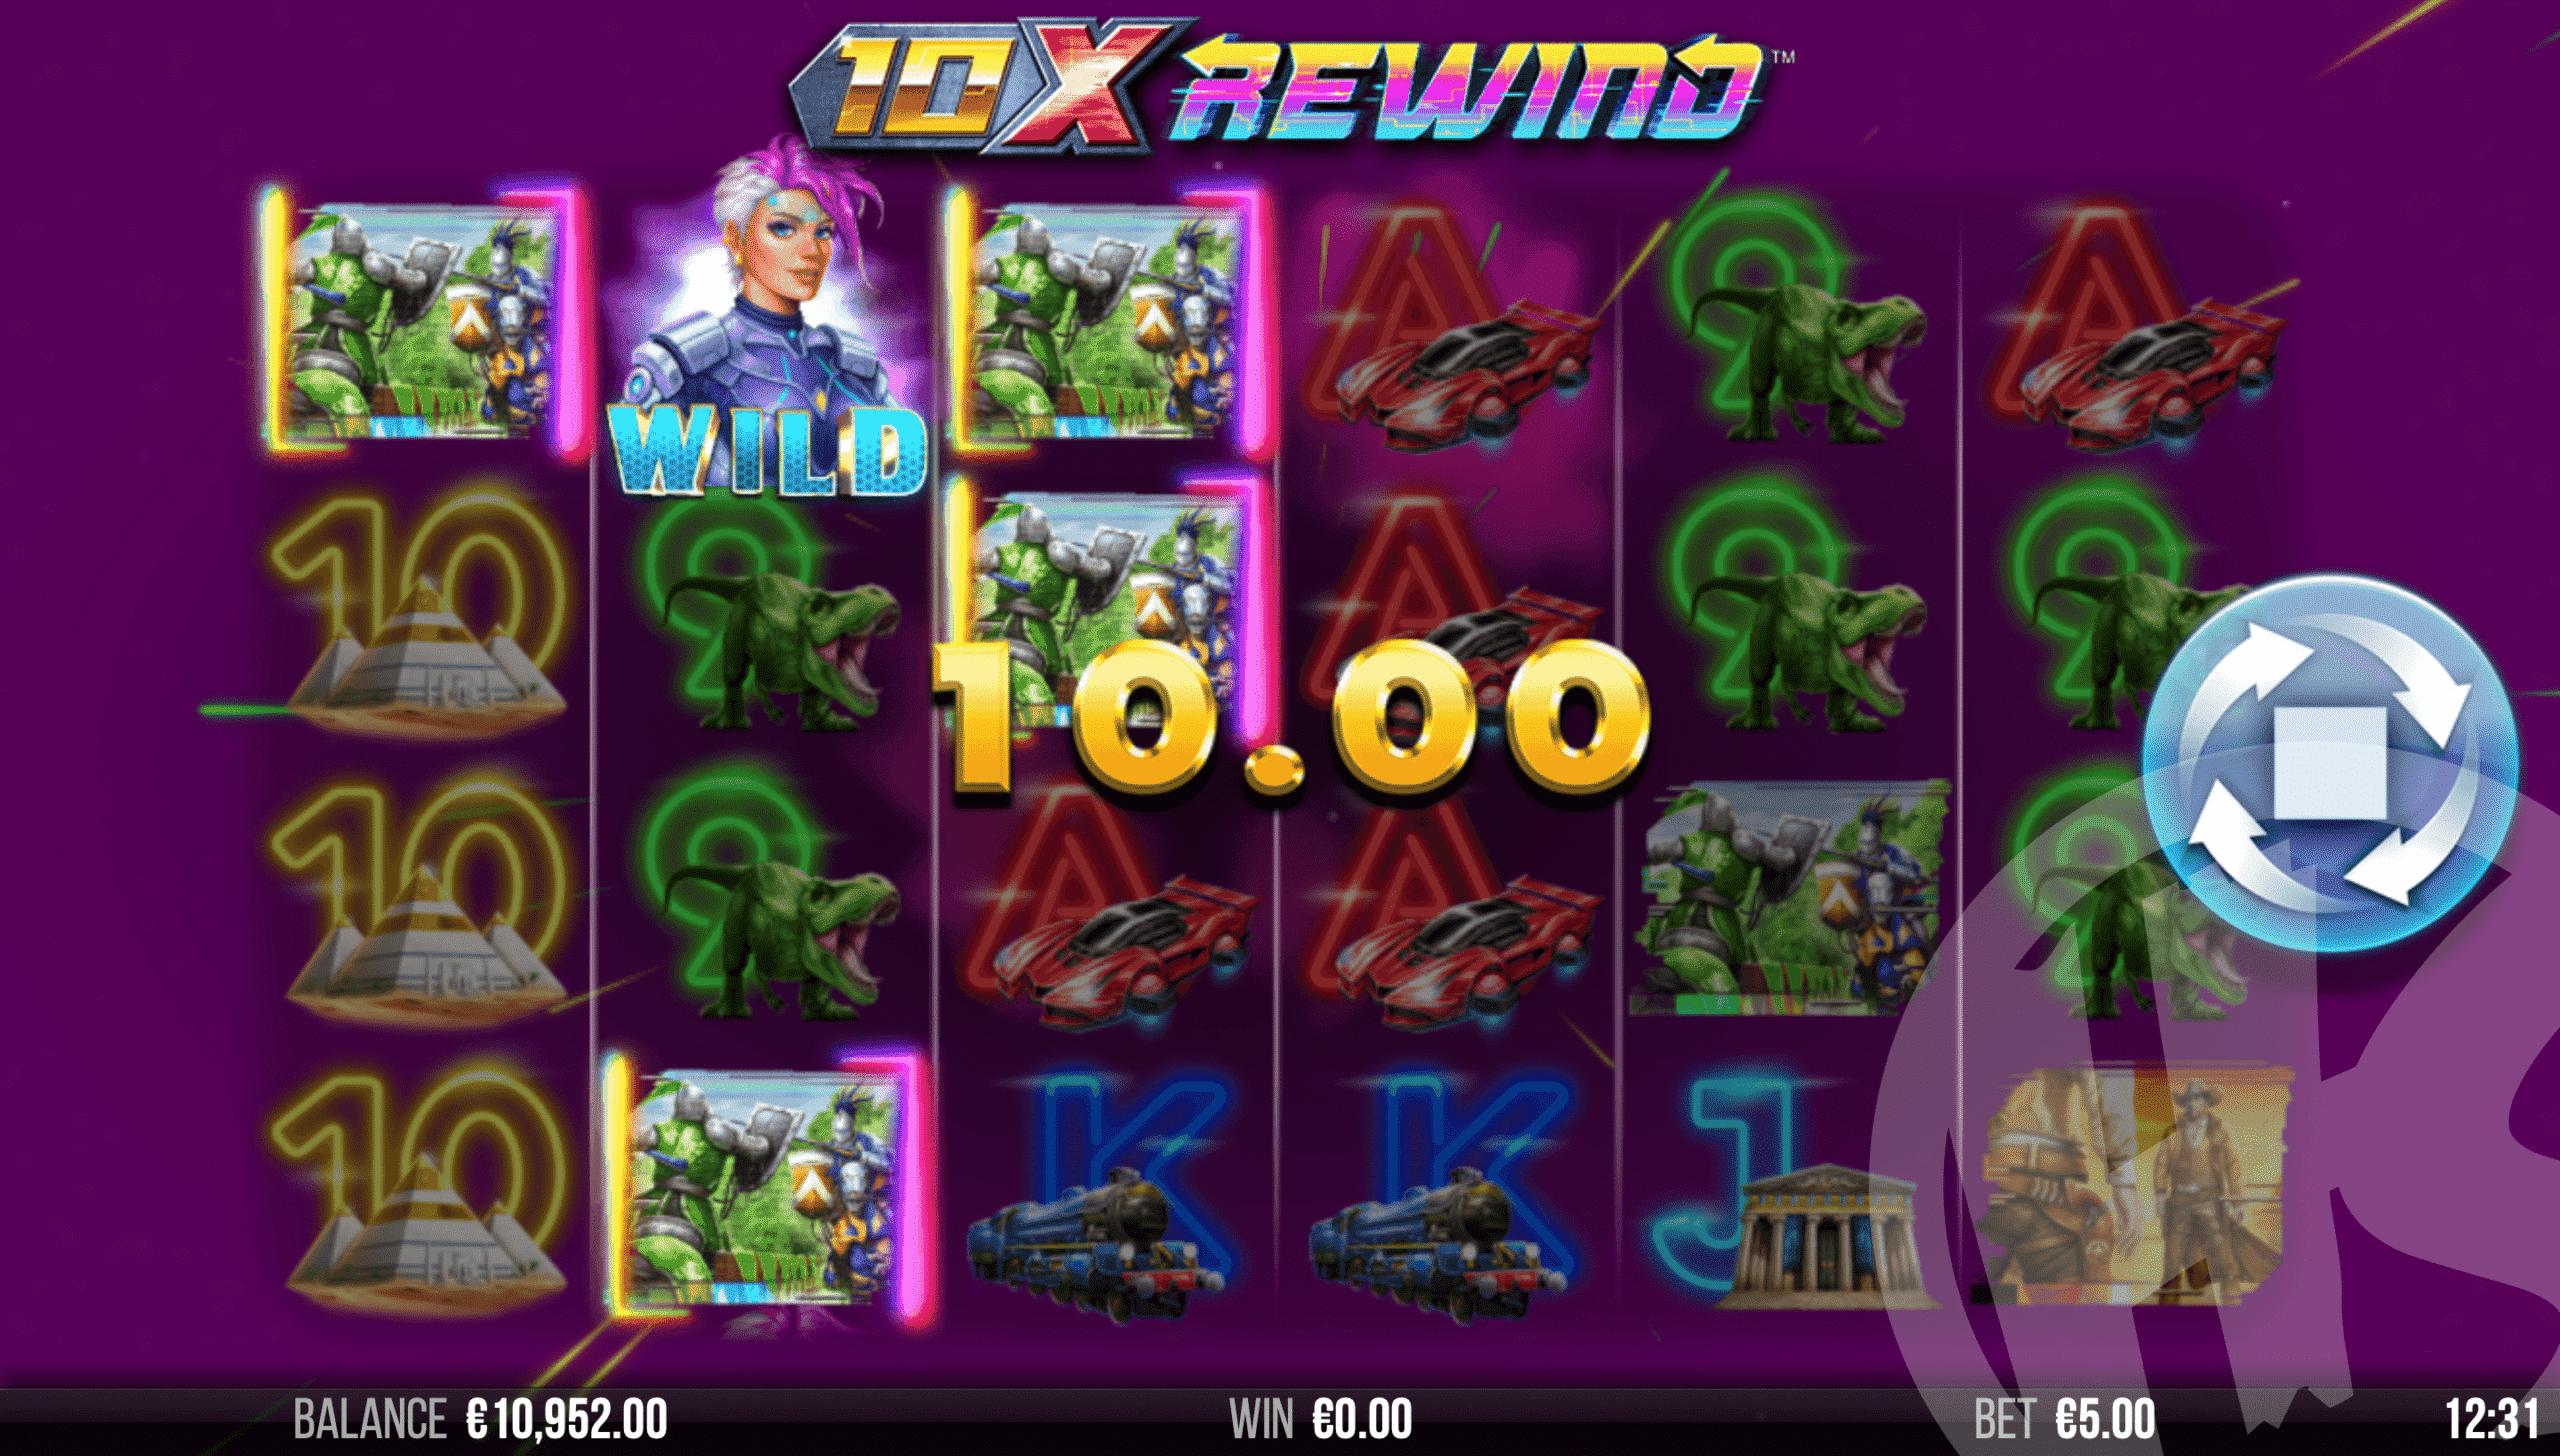 10x Rewind Offers Players 4,096 Ways to Win